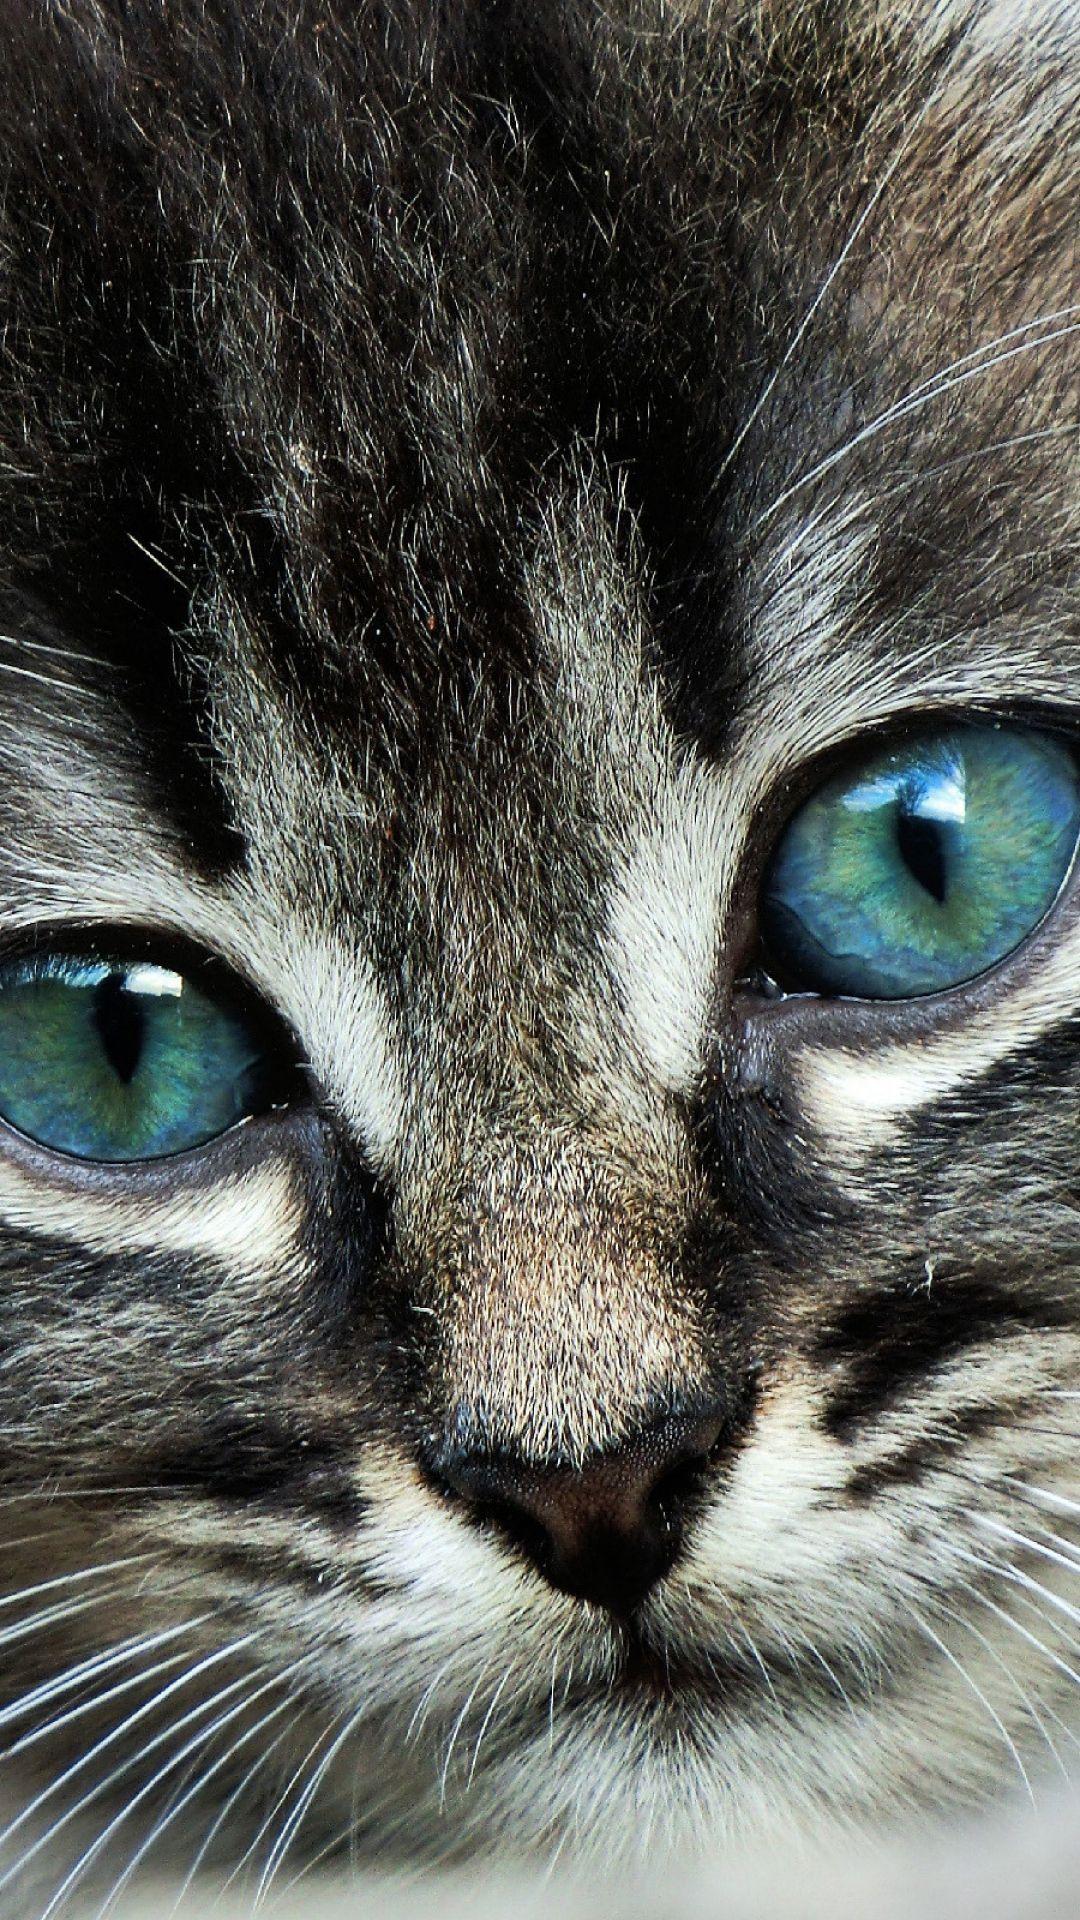 Cat Face Eyes Color Beautiful Cats Cute Cats Pretty Cats